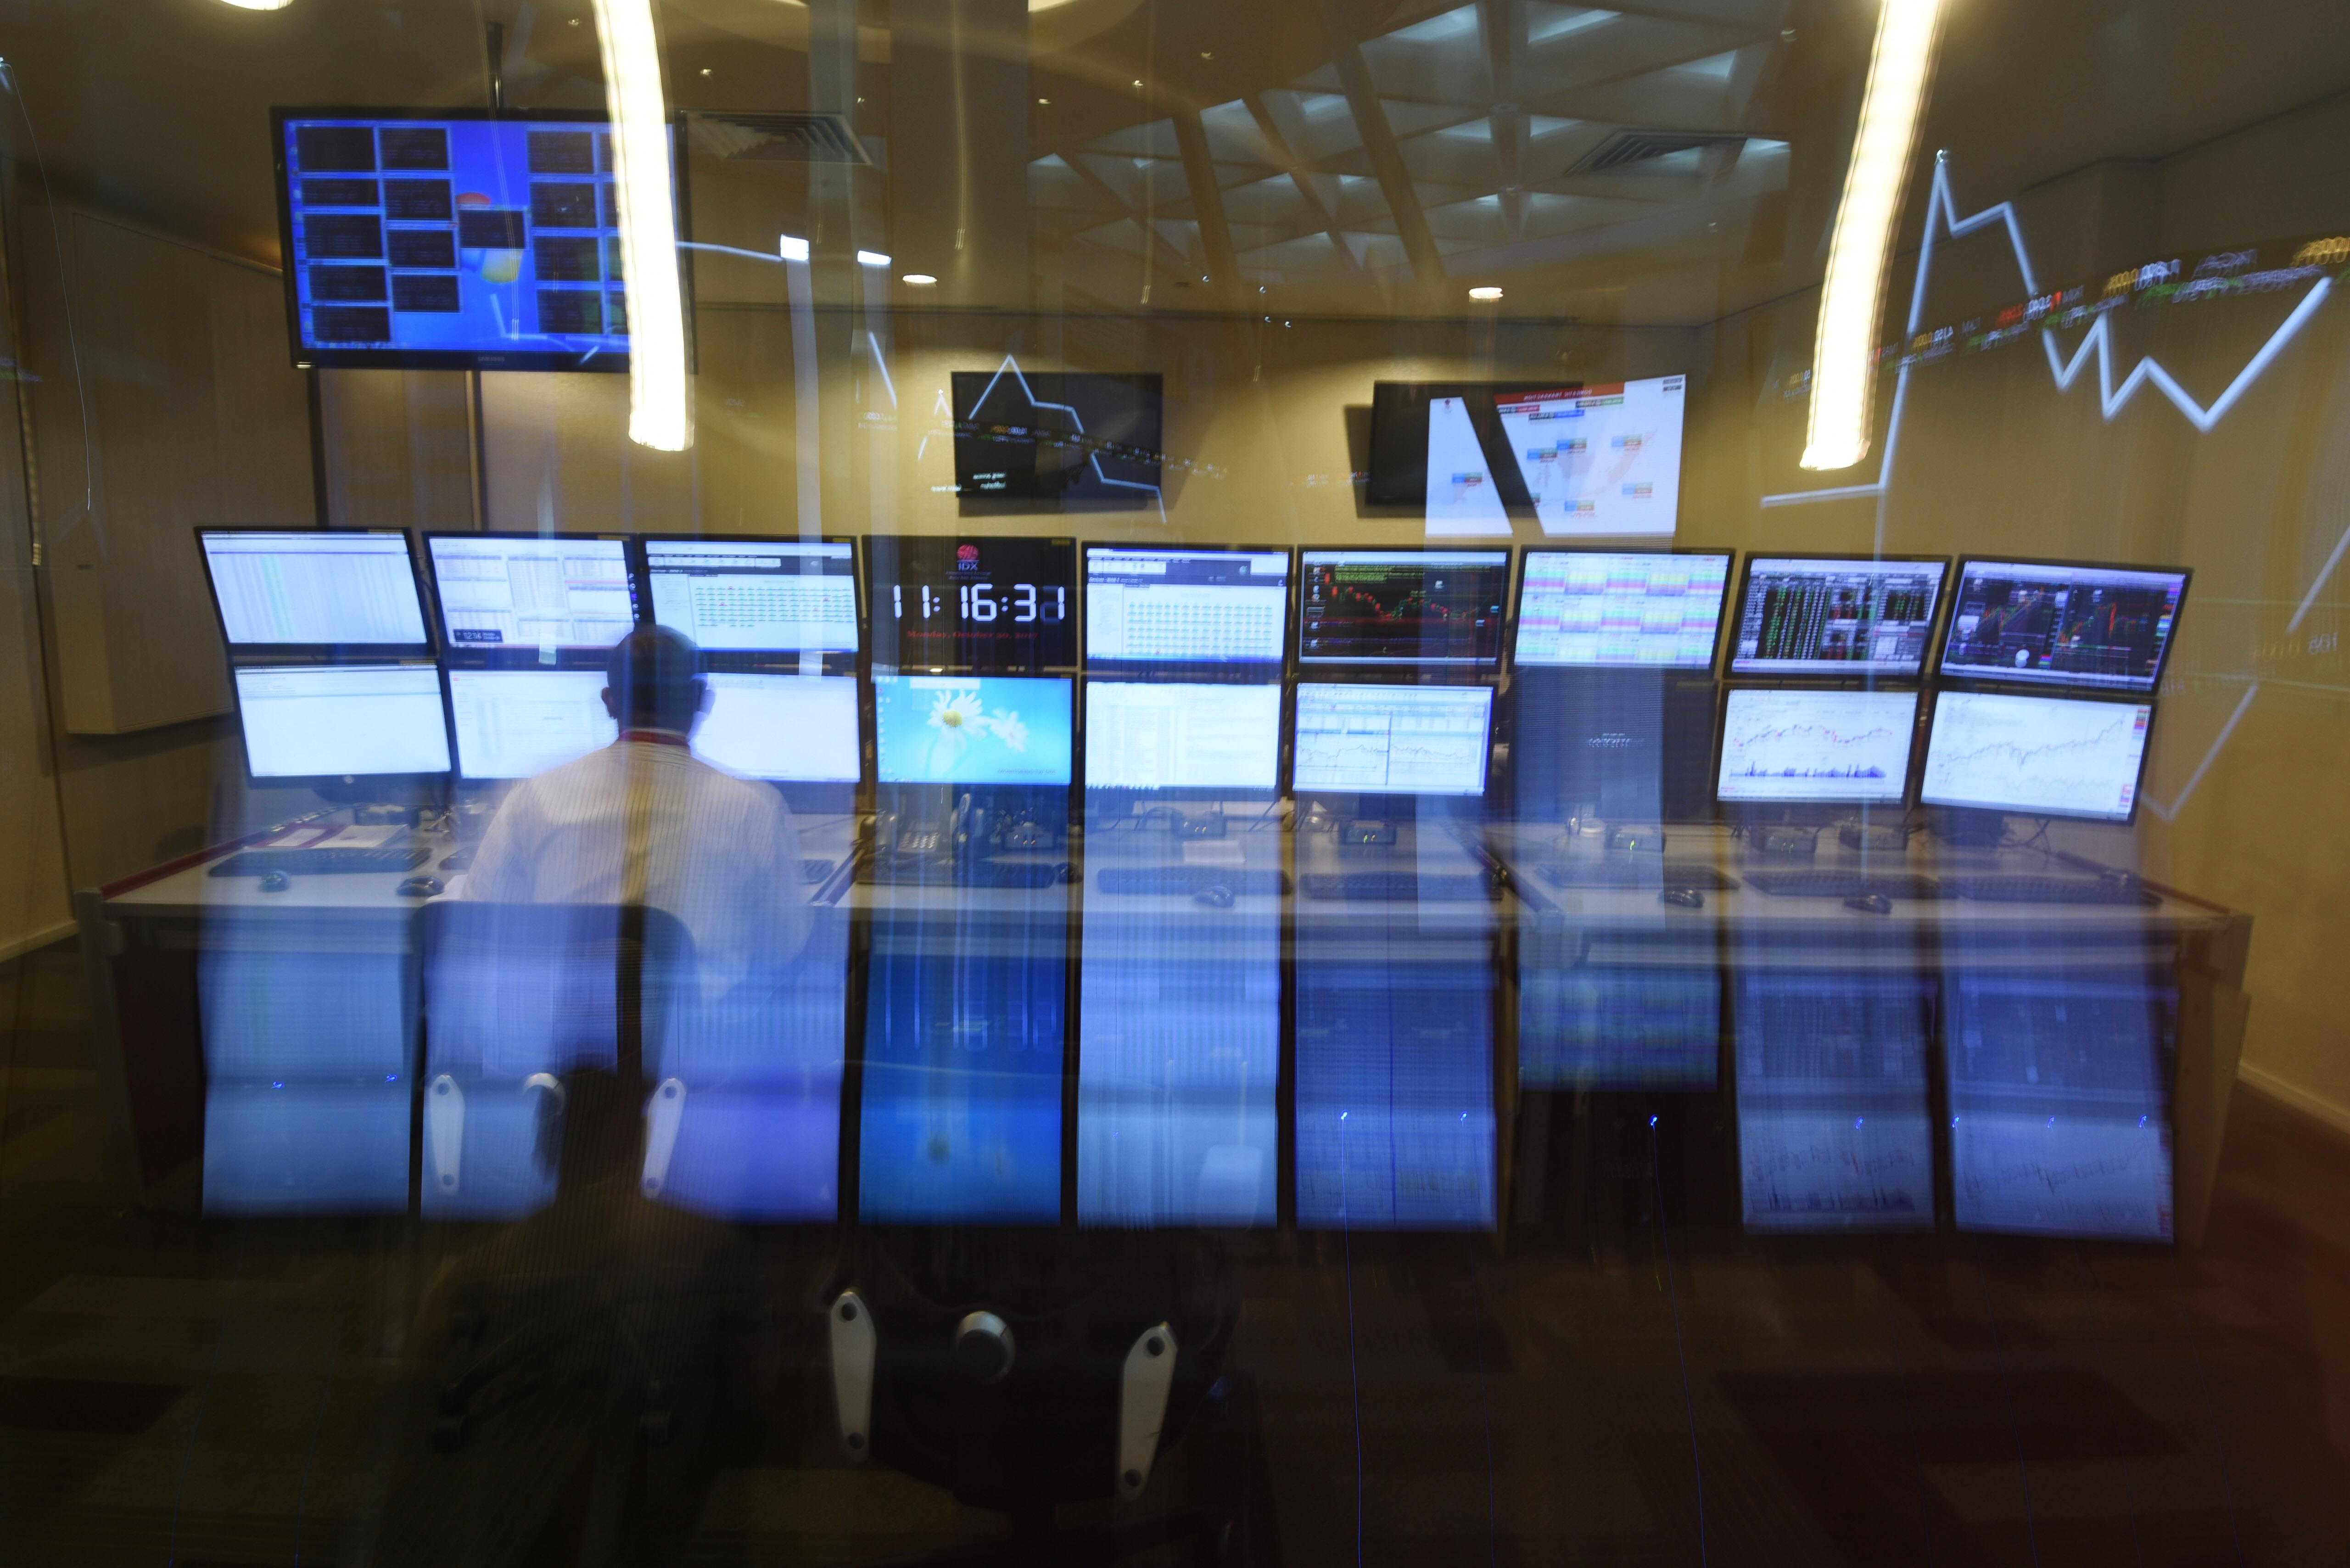 Ramalan IHSG Terkoreksi, Indosurya Sekuritas Sebut Sekarang Waktunya Akumulasi